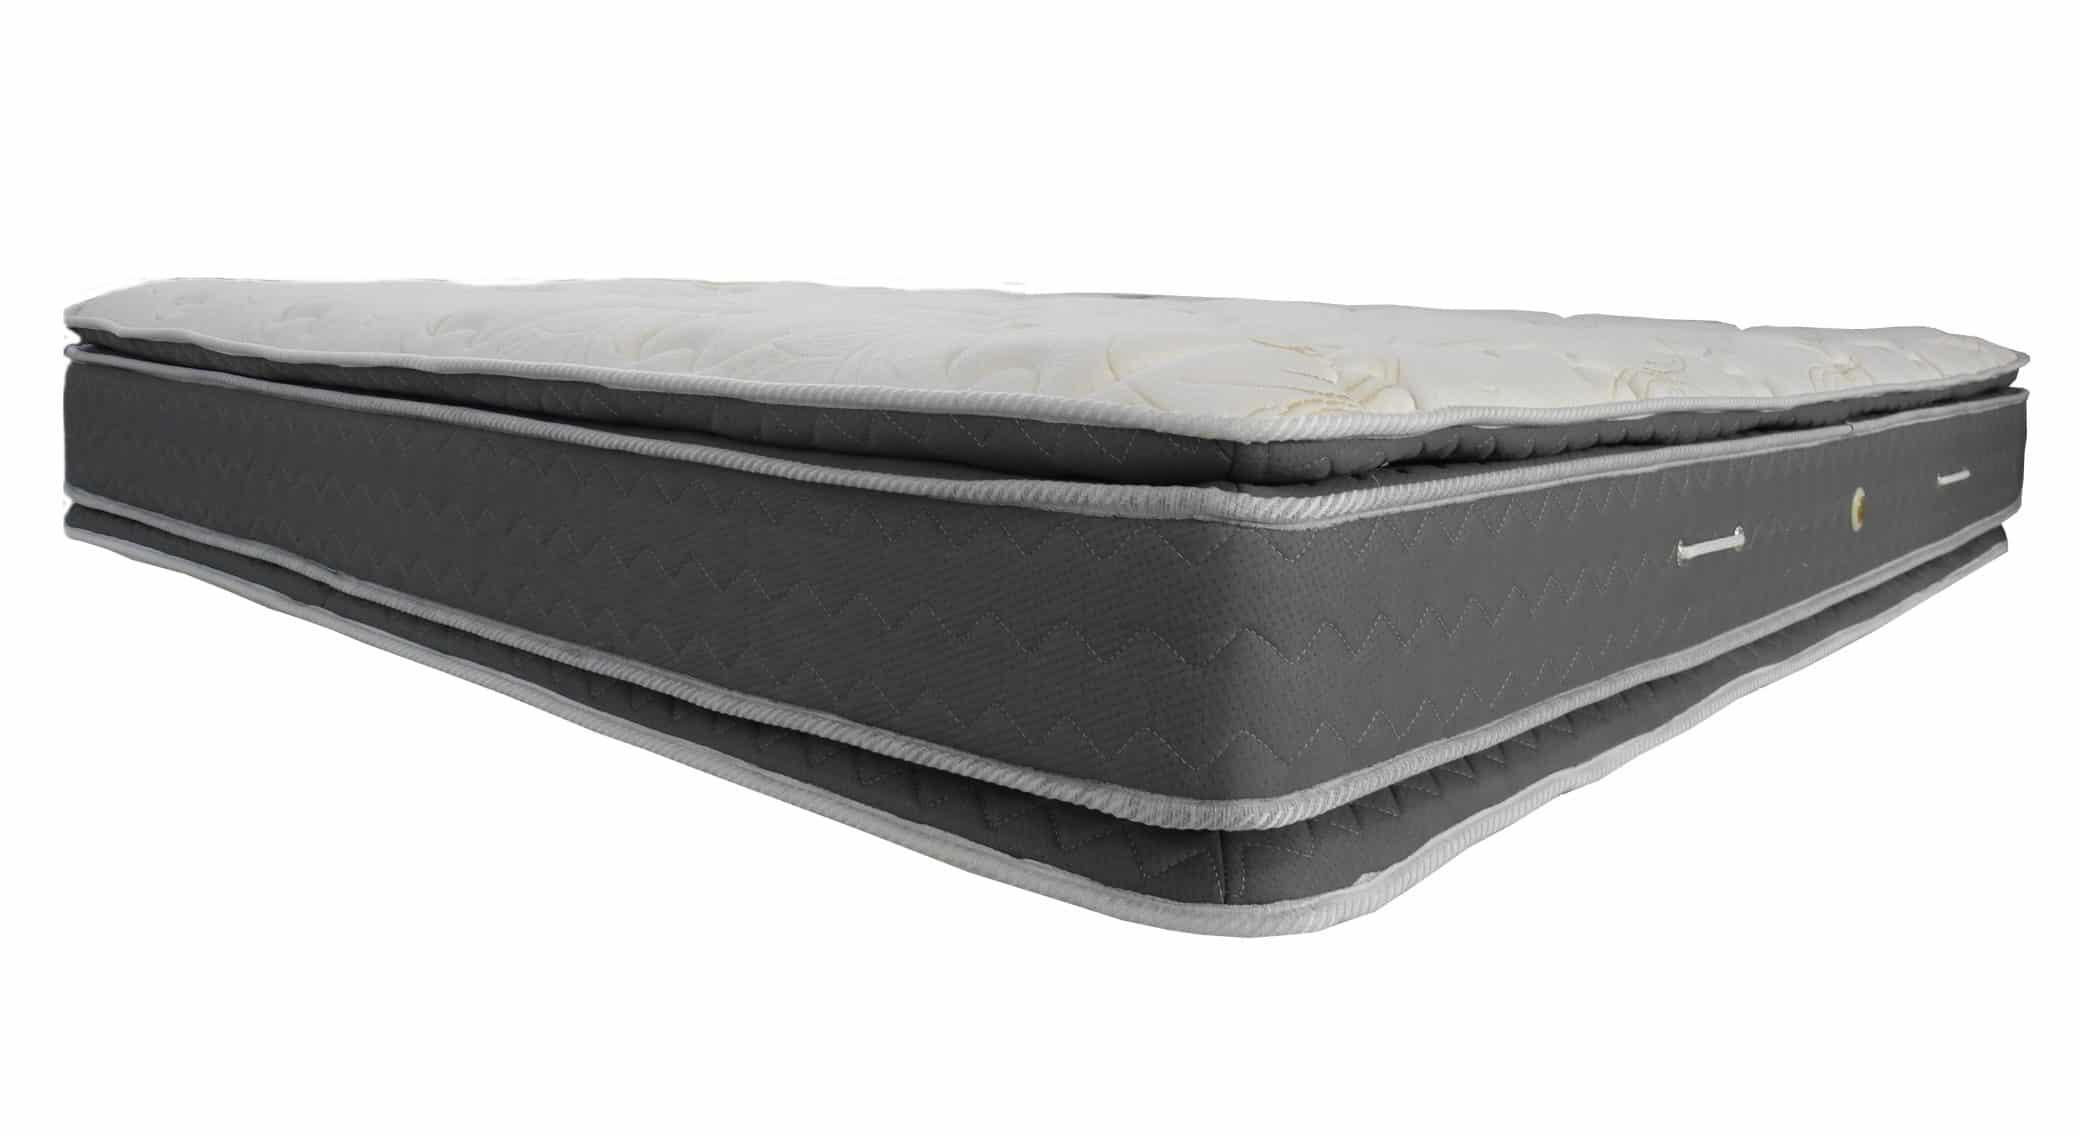 Colch n espuma alta densidad max 30 con doble pillow 190x140 arcoiris - Colchon al vacio ...